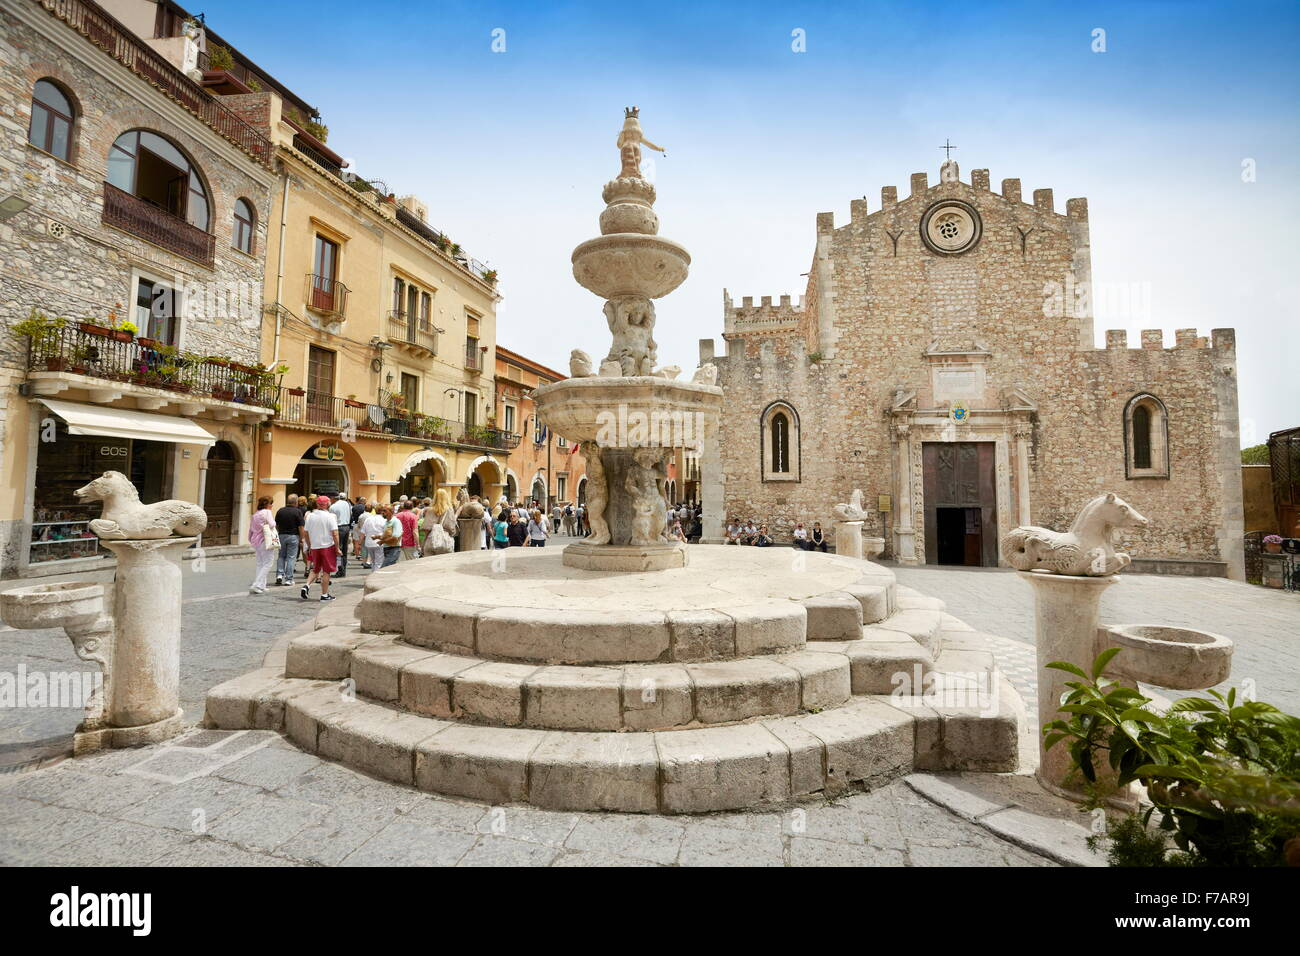 Kathedrale von San Nicola und barocken Brunnen, Corso Umberto, Taormina, alte Stadt, Sizilien, Italien Stockbild